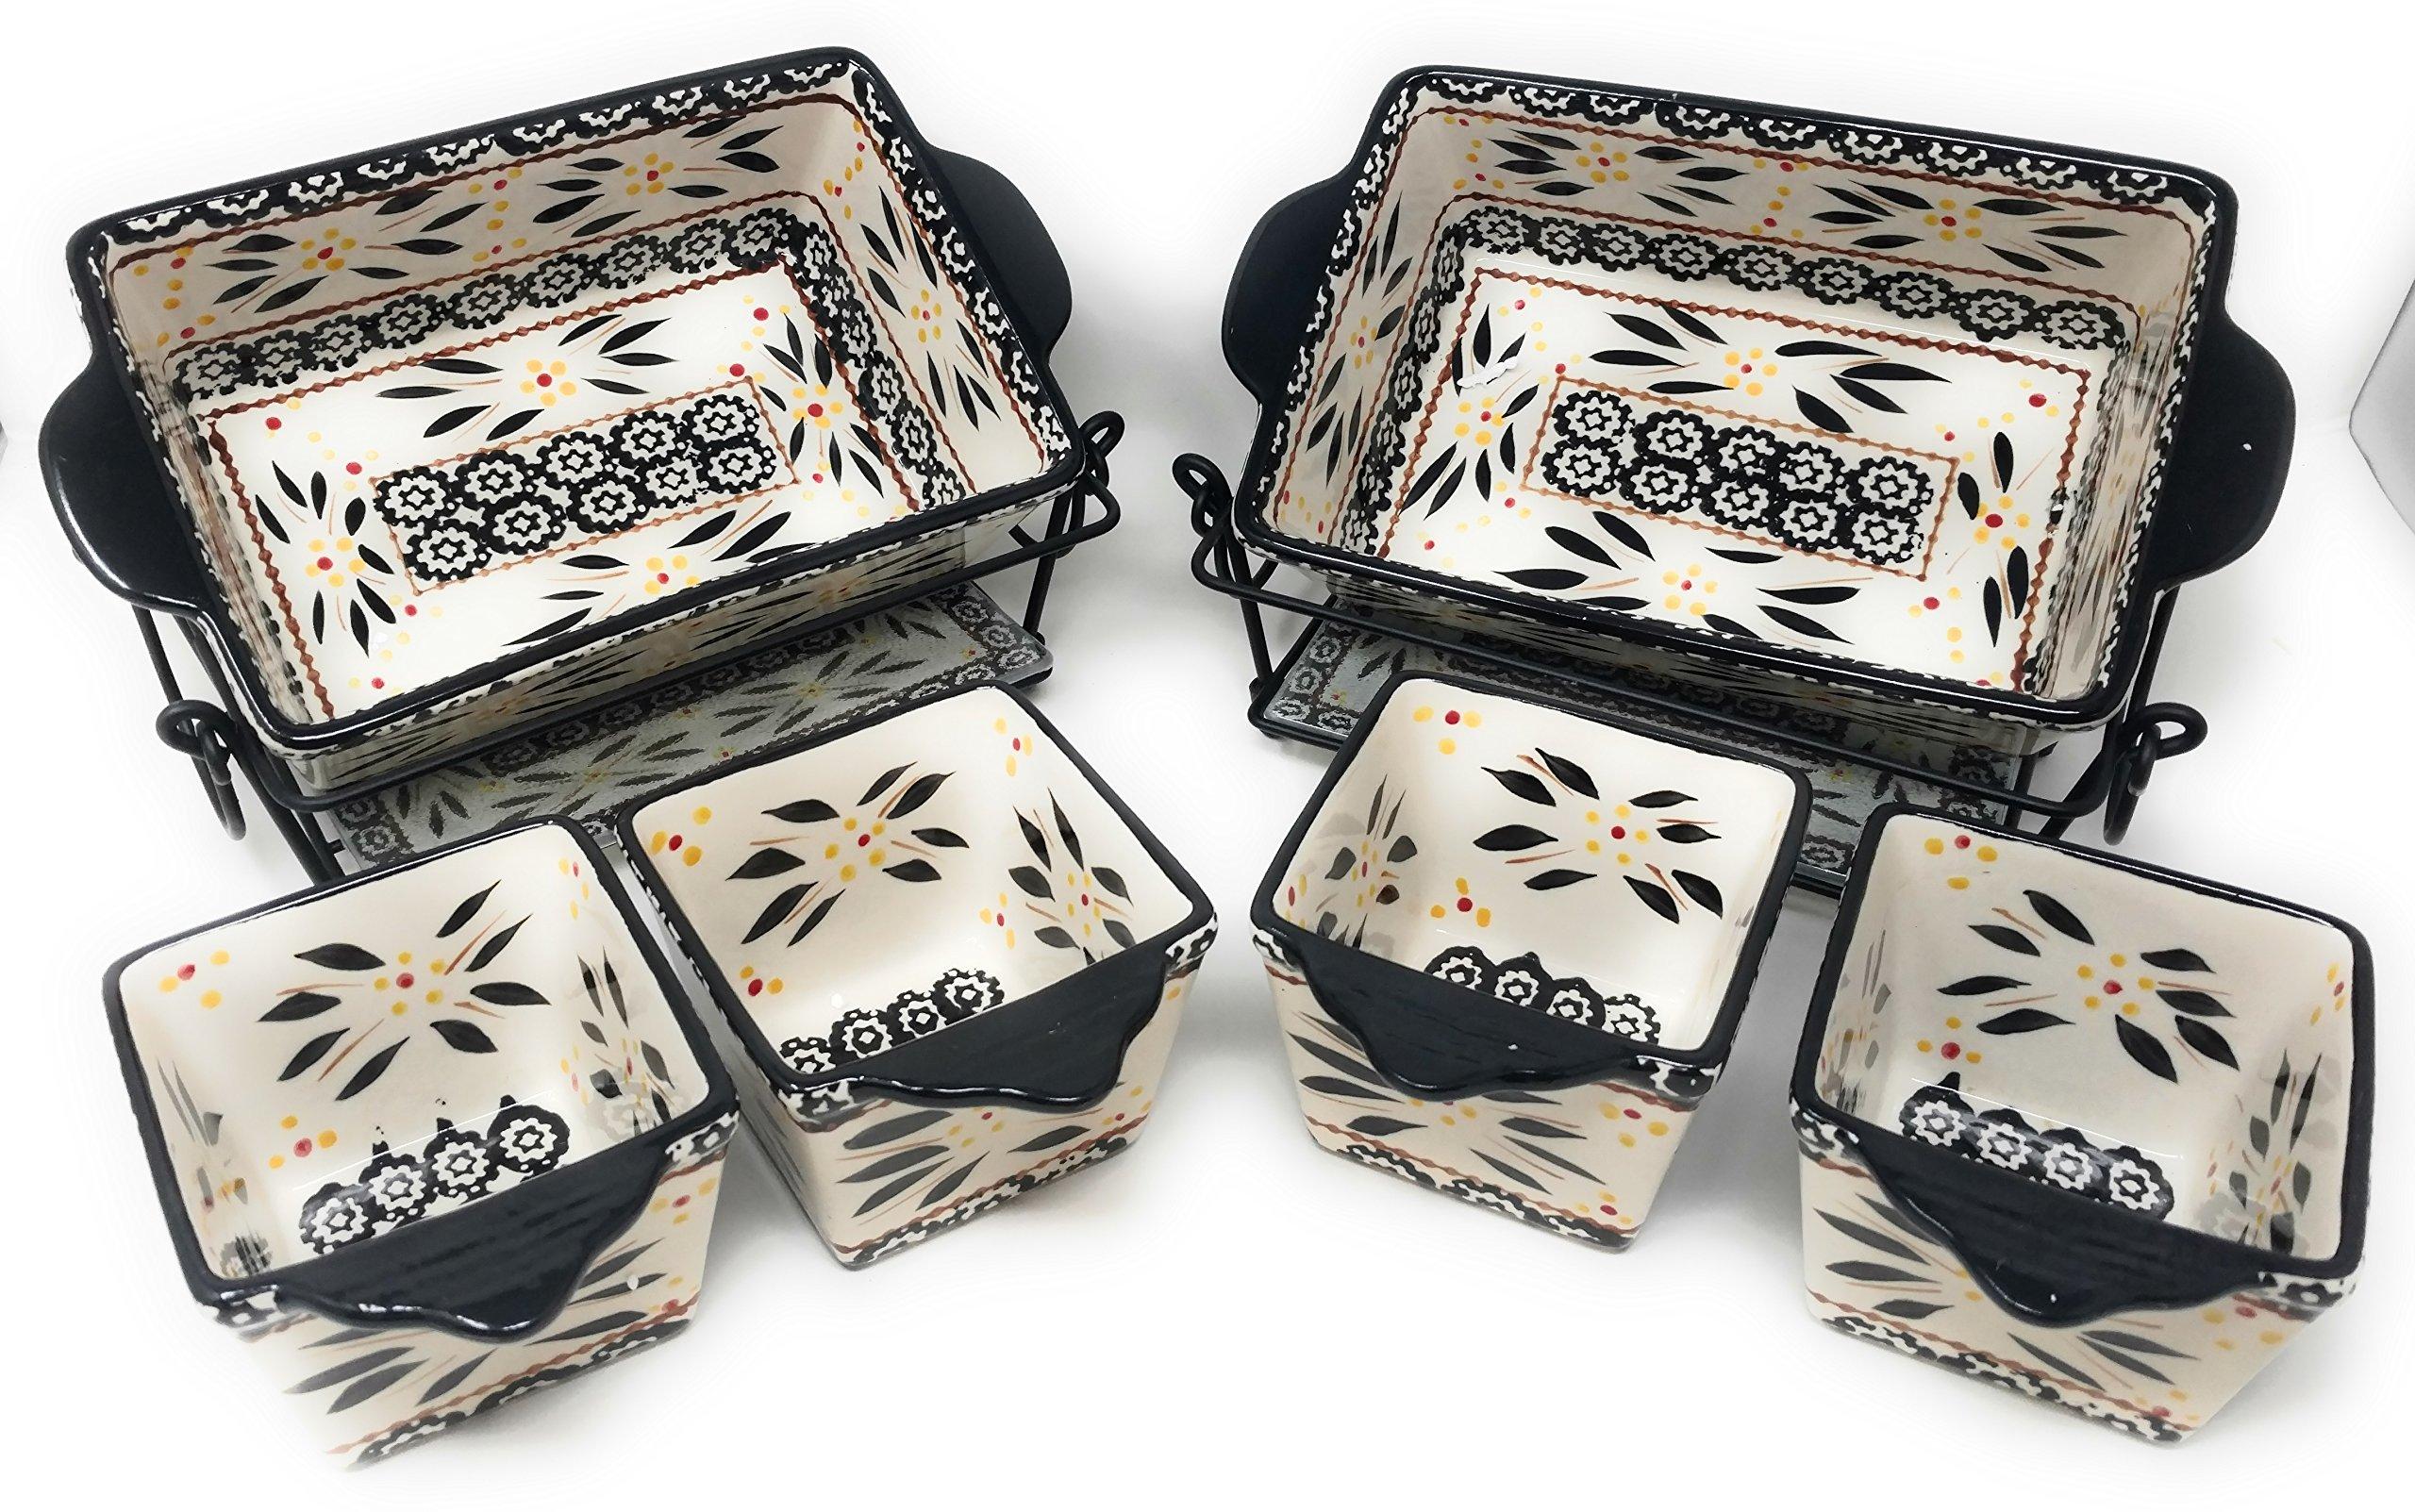 Temp-tations 6pc Mini Bakers - TWO 1.5Qt Loaf Pans & FOUR 10oz Ramekins (Old World Black)